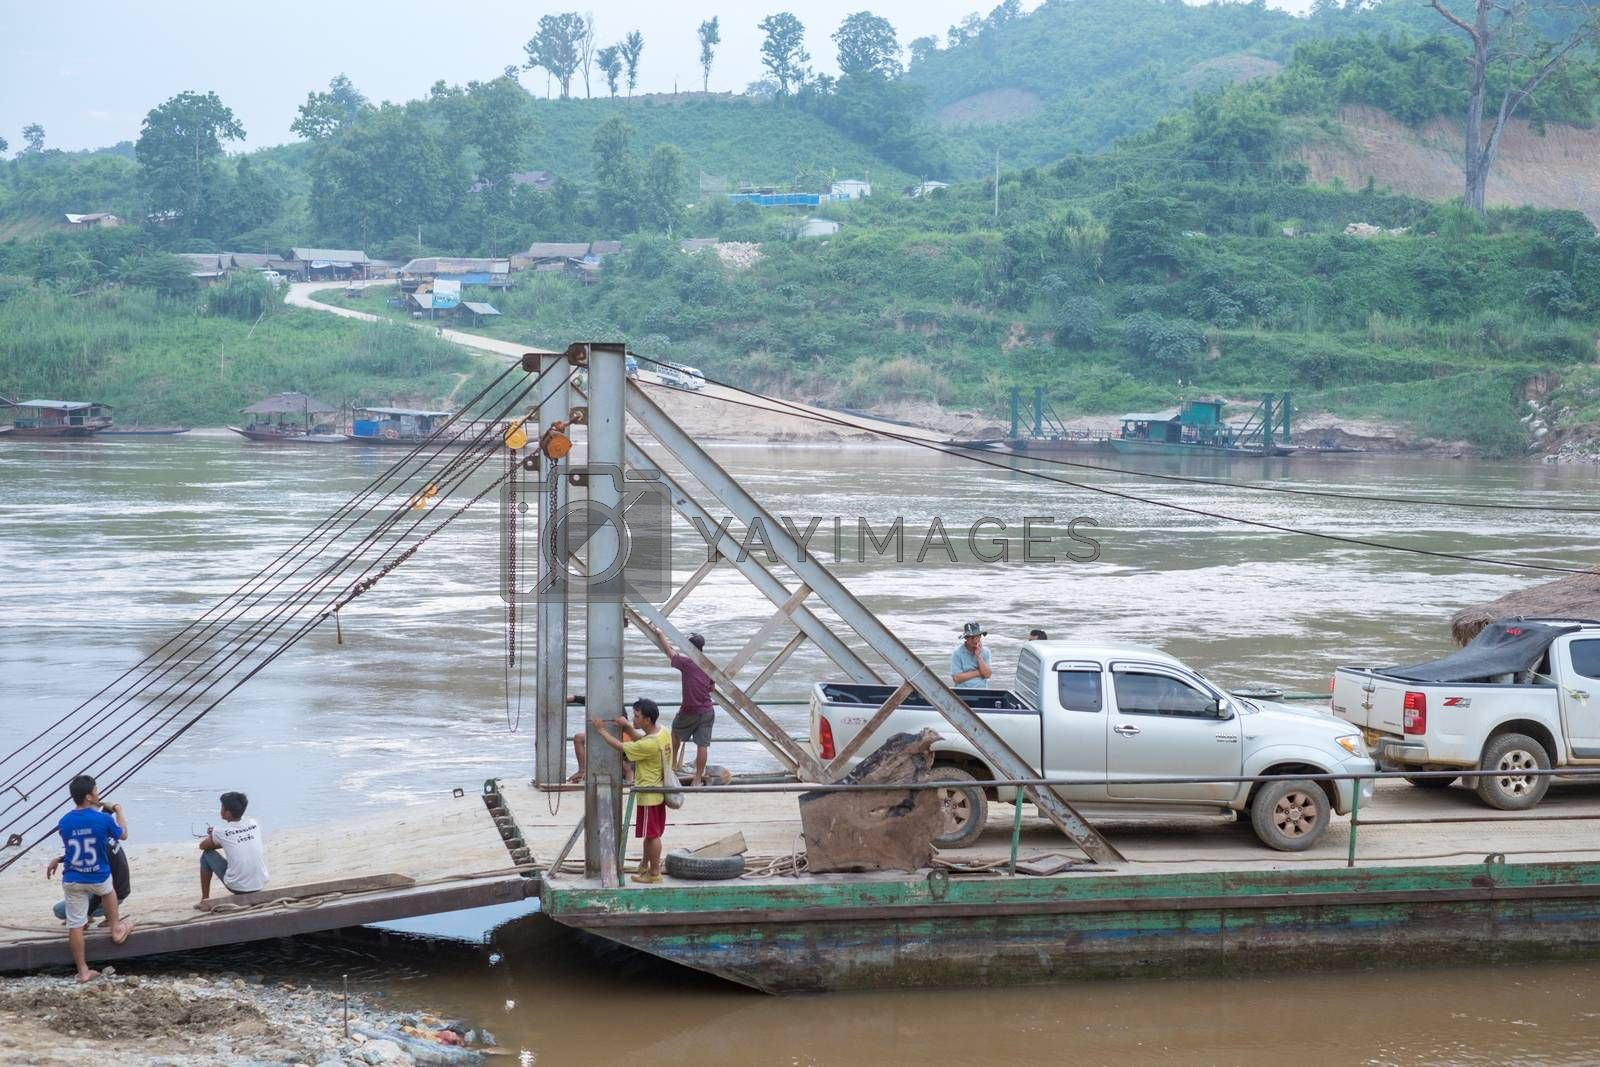 Unidentified ferry is carrying trucks across the Mekong River on June 10,2015 in Houay xai harbor, Bokeo , Laos pdr